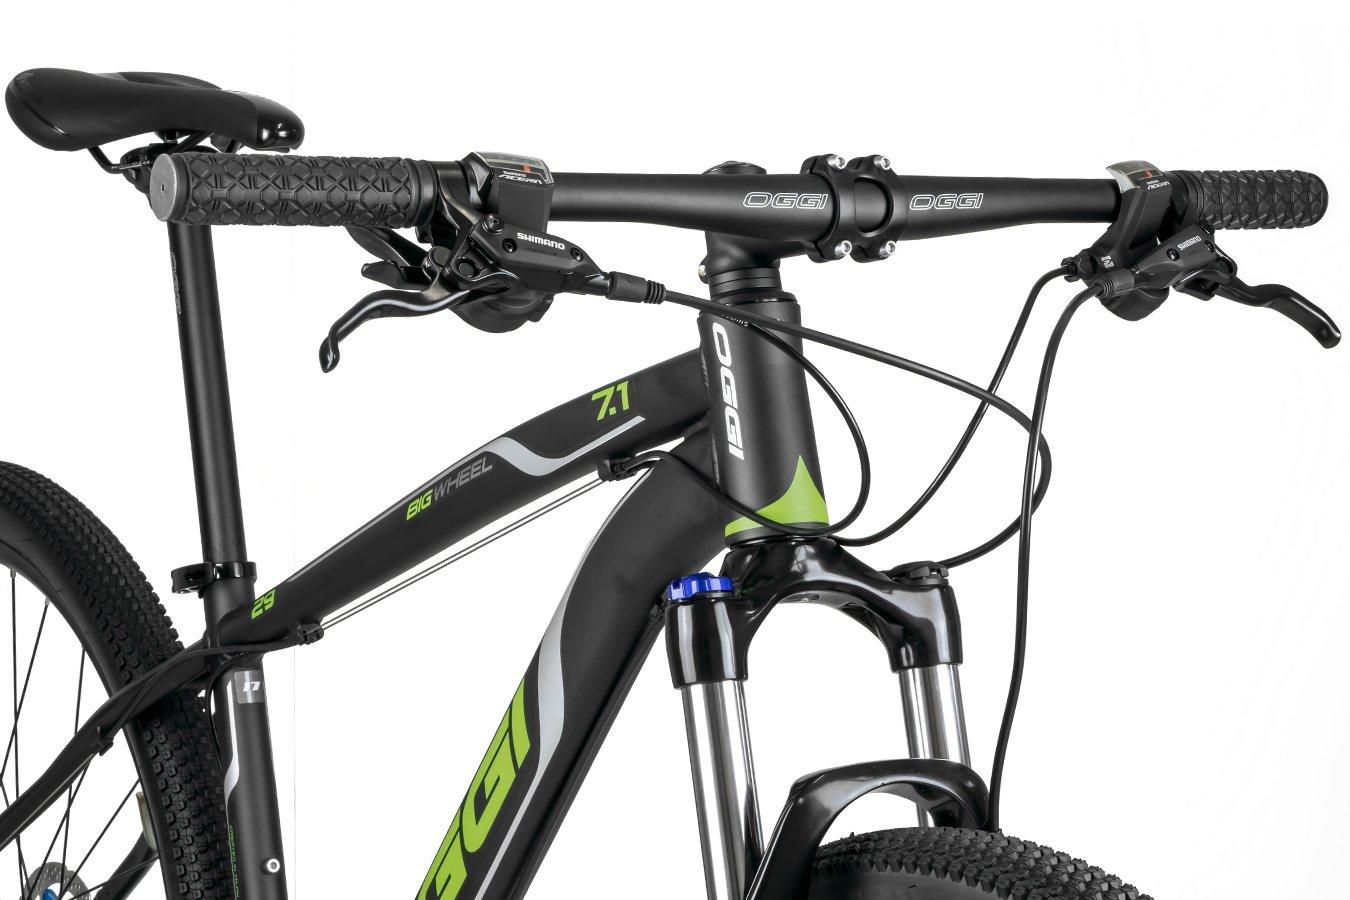 Bicicleta 29 Big Wheel 7.1 2017 Alumínio 27v Acera - Oggi